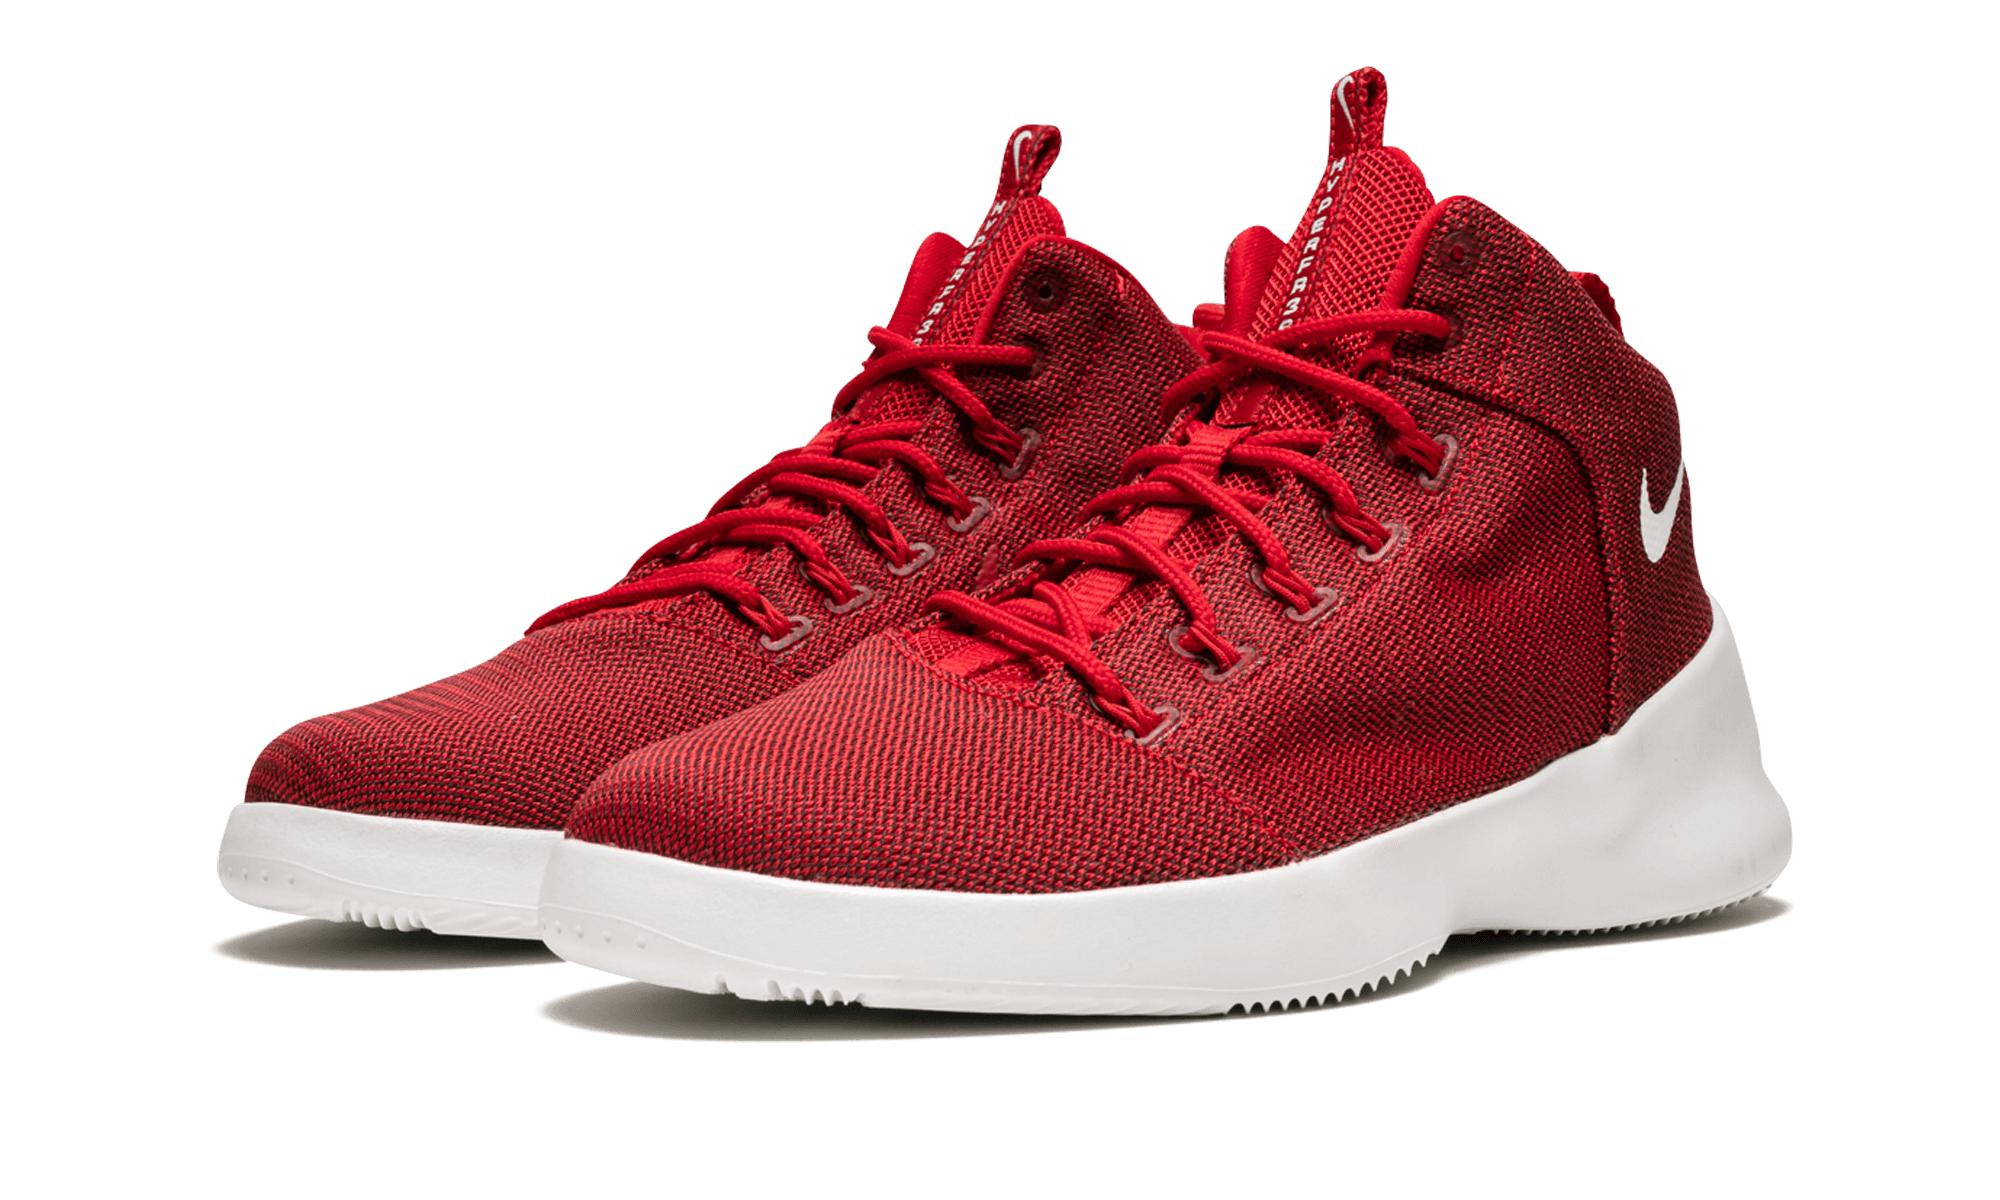 huge discount 6e7d5 2ceca Lyst - Nike Hyperfr3sh in Red for Men